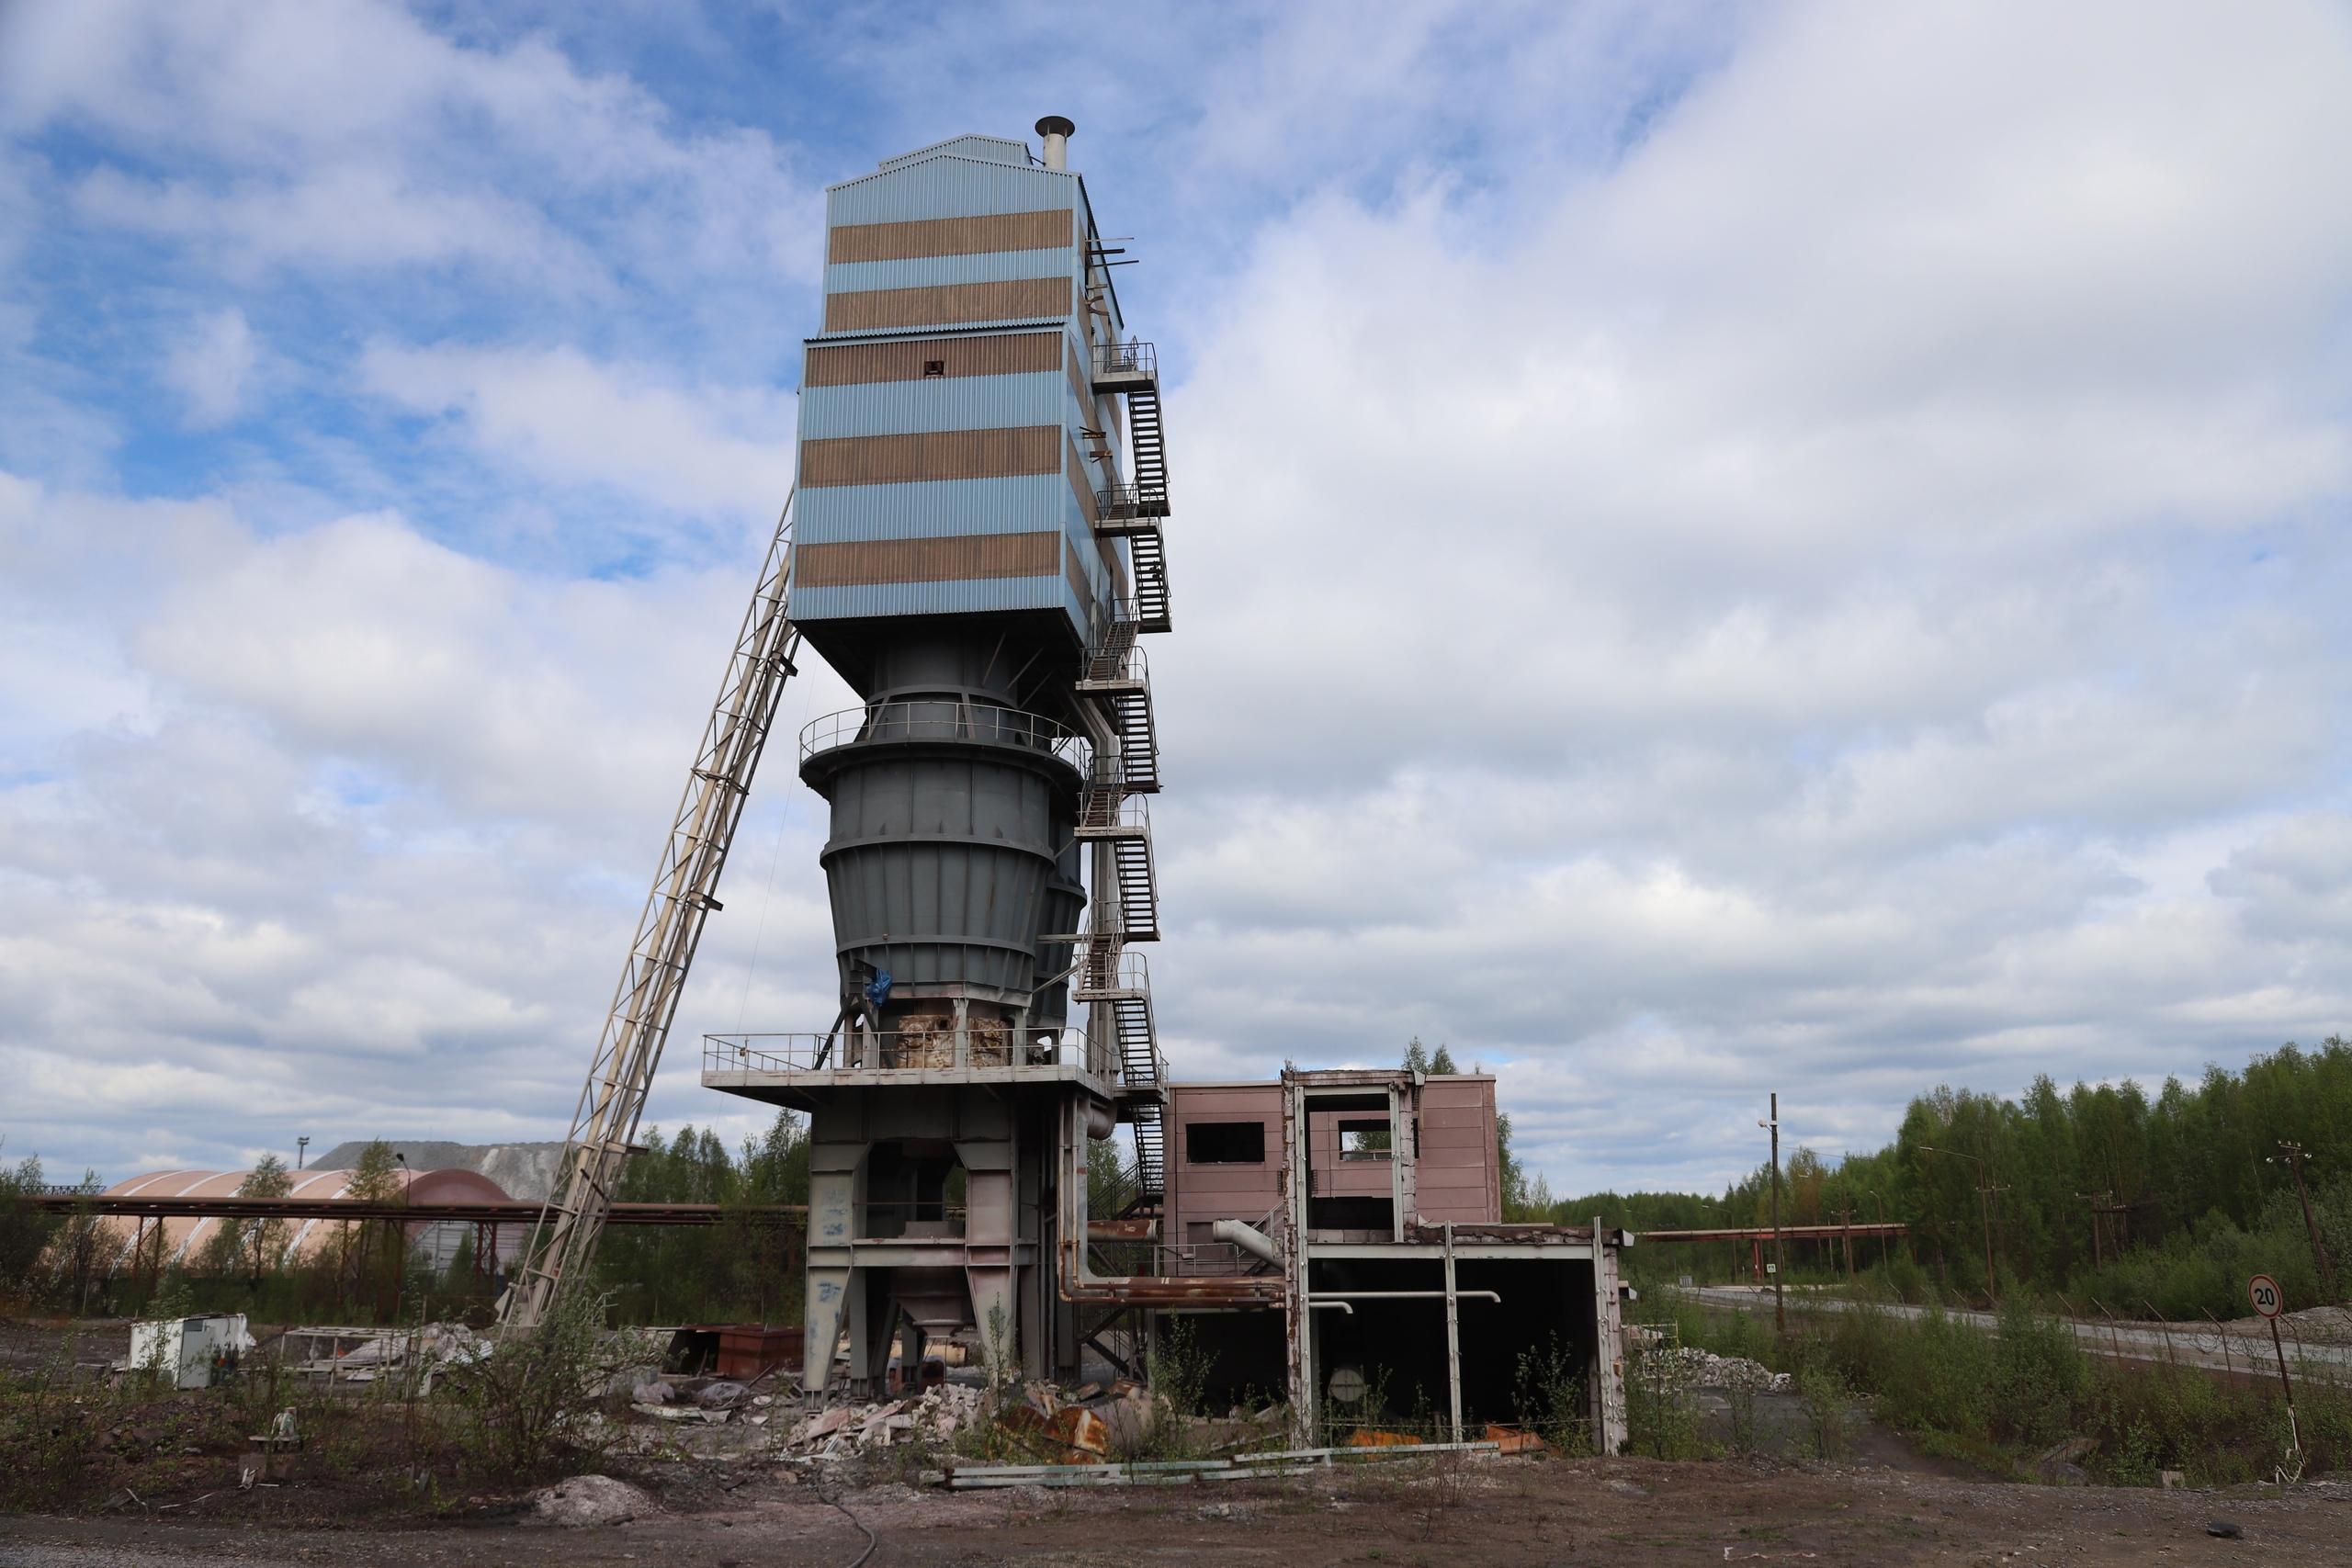 Костомукша, Карельский окатыш, Северсталь, комбинат, ГОК, железная руда